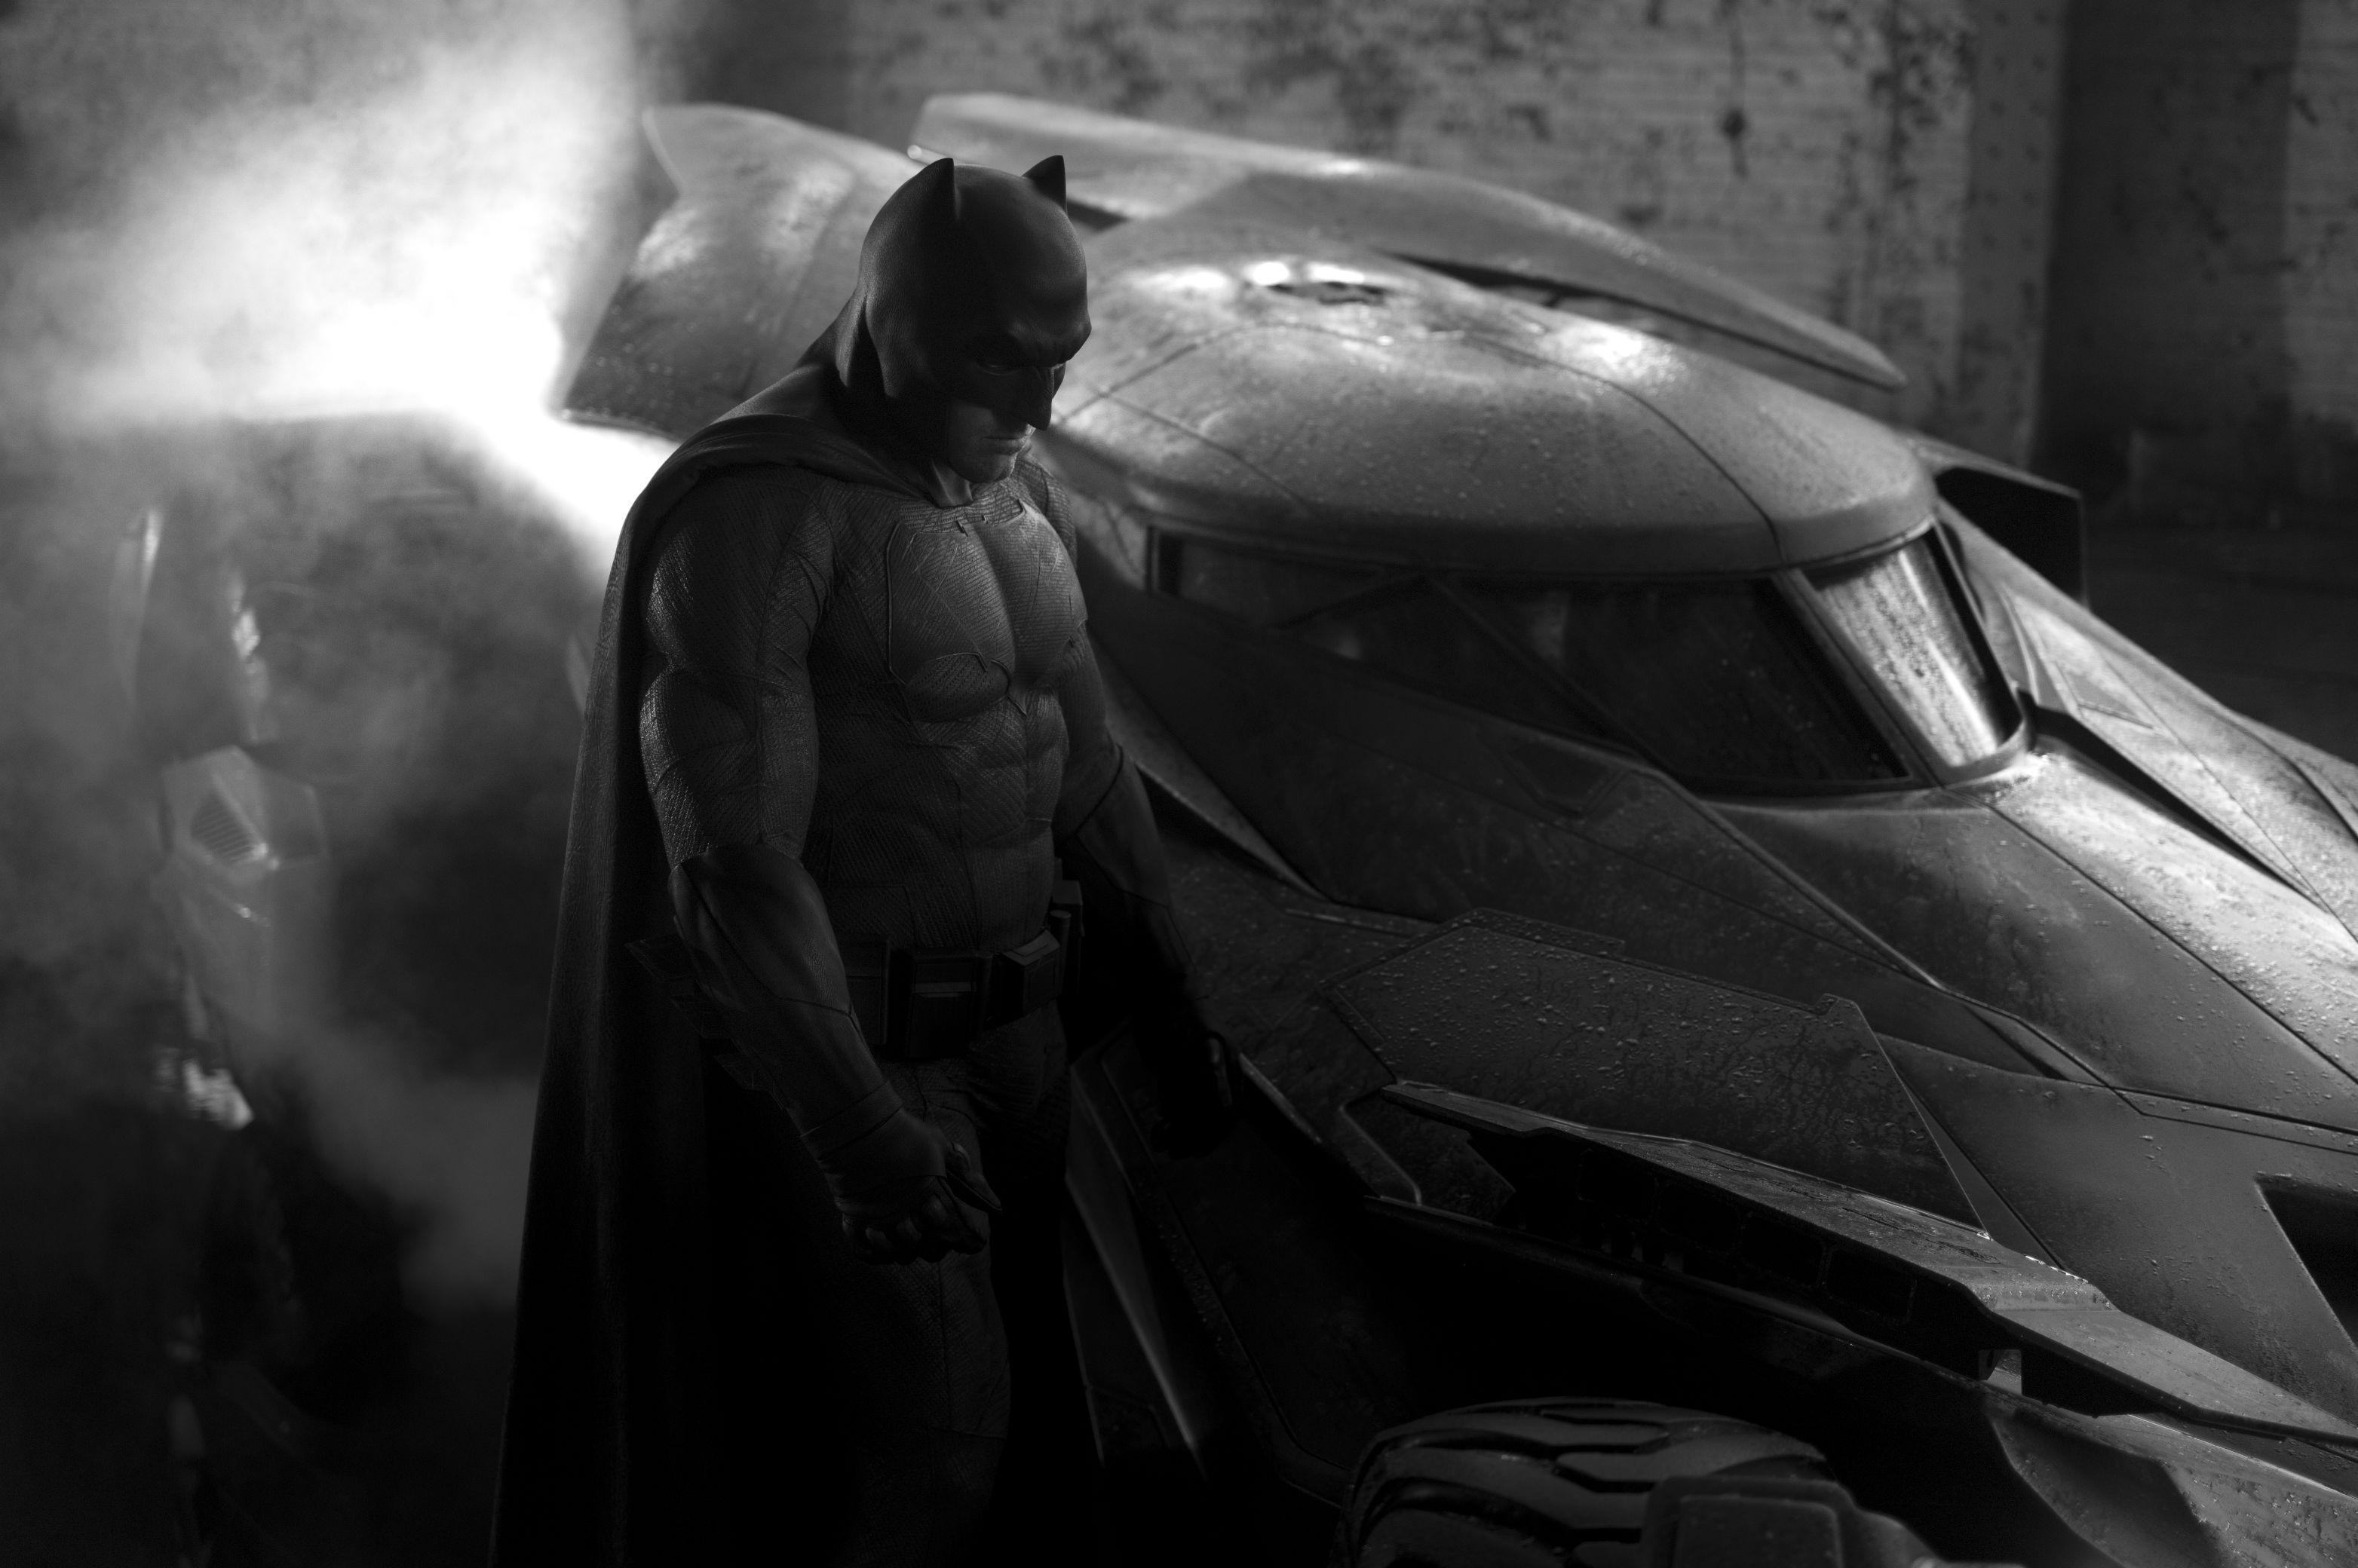 Batman Ben Affleck Visual Uniforme Batmovel